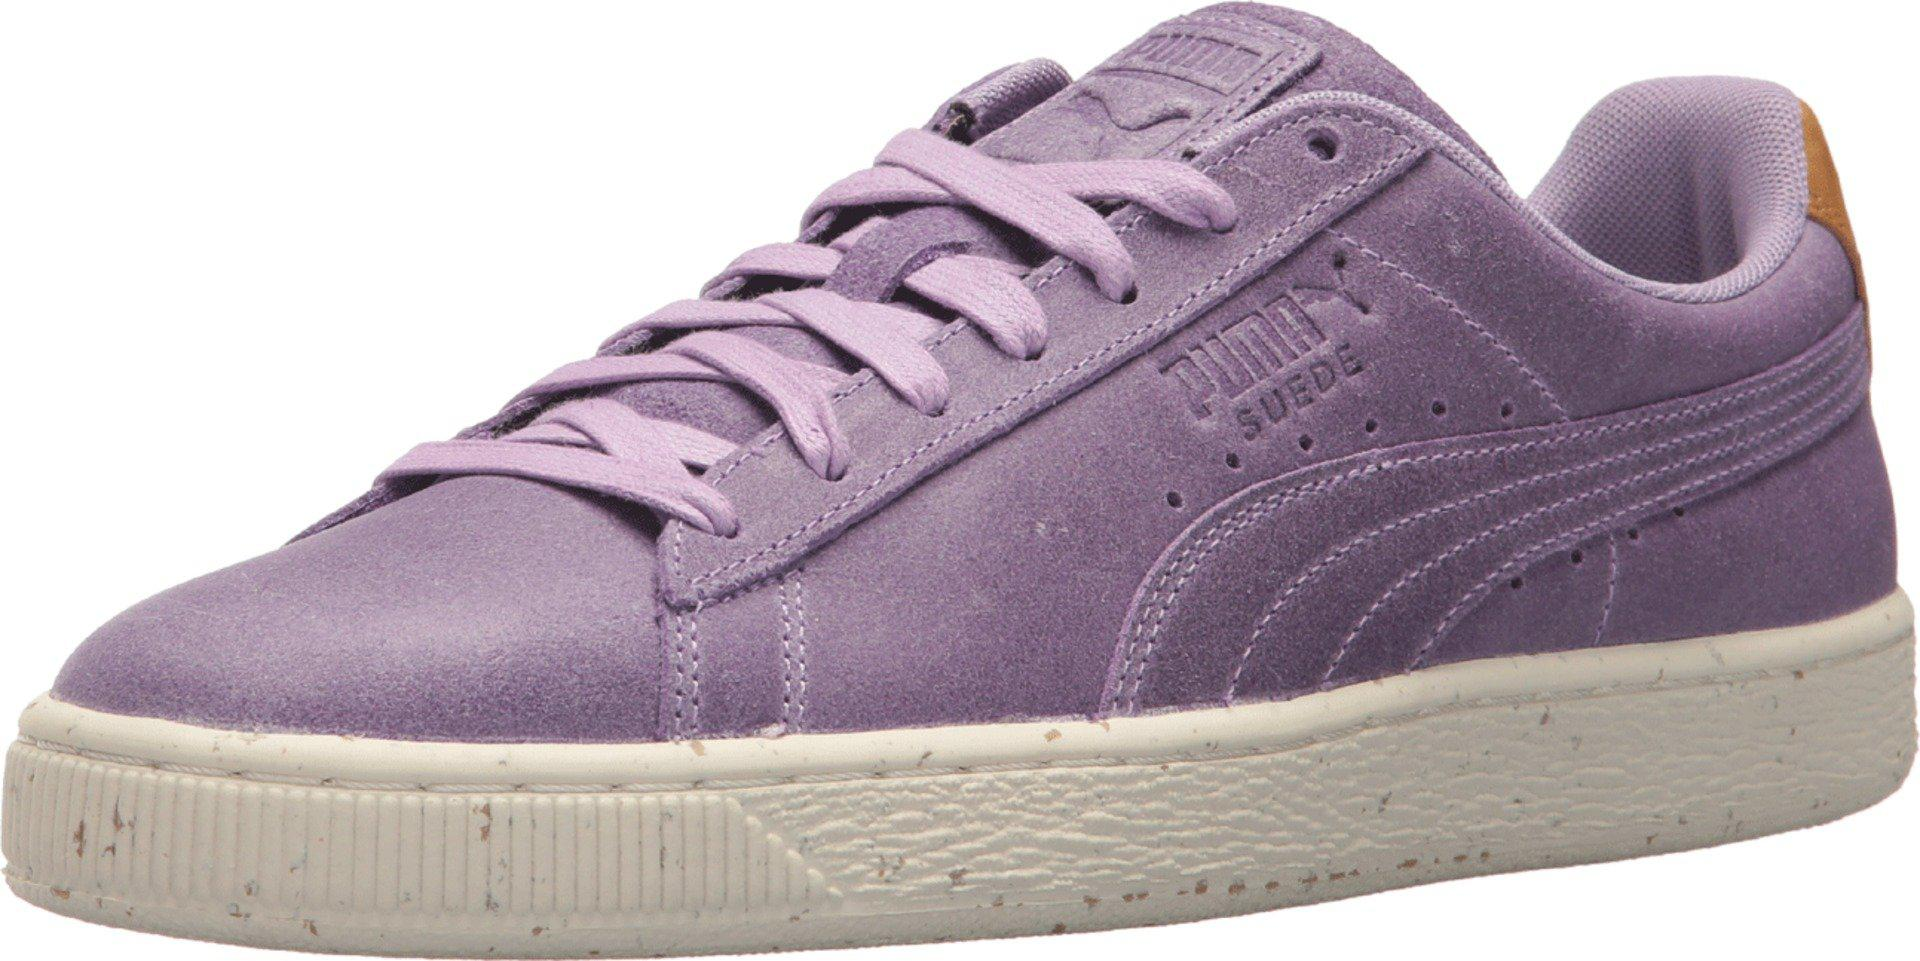 cb3ad0af3027 PUMA Suede Deco in Purple for Men - Lyst